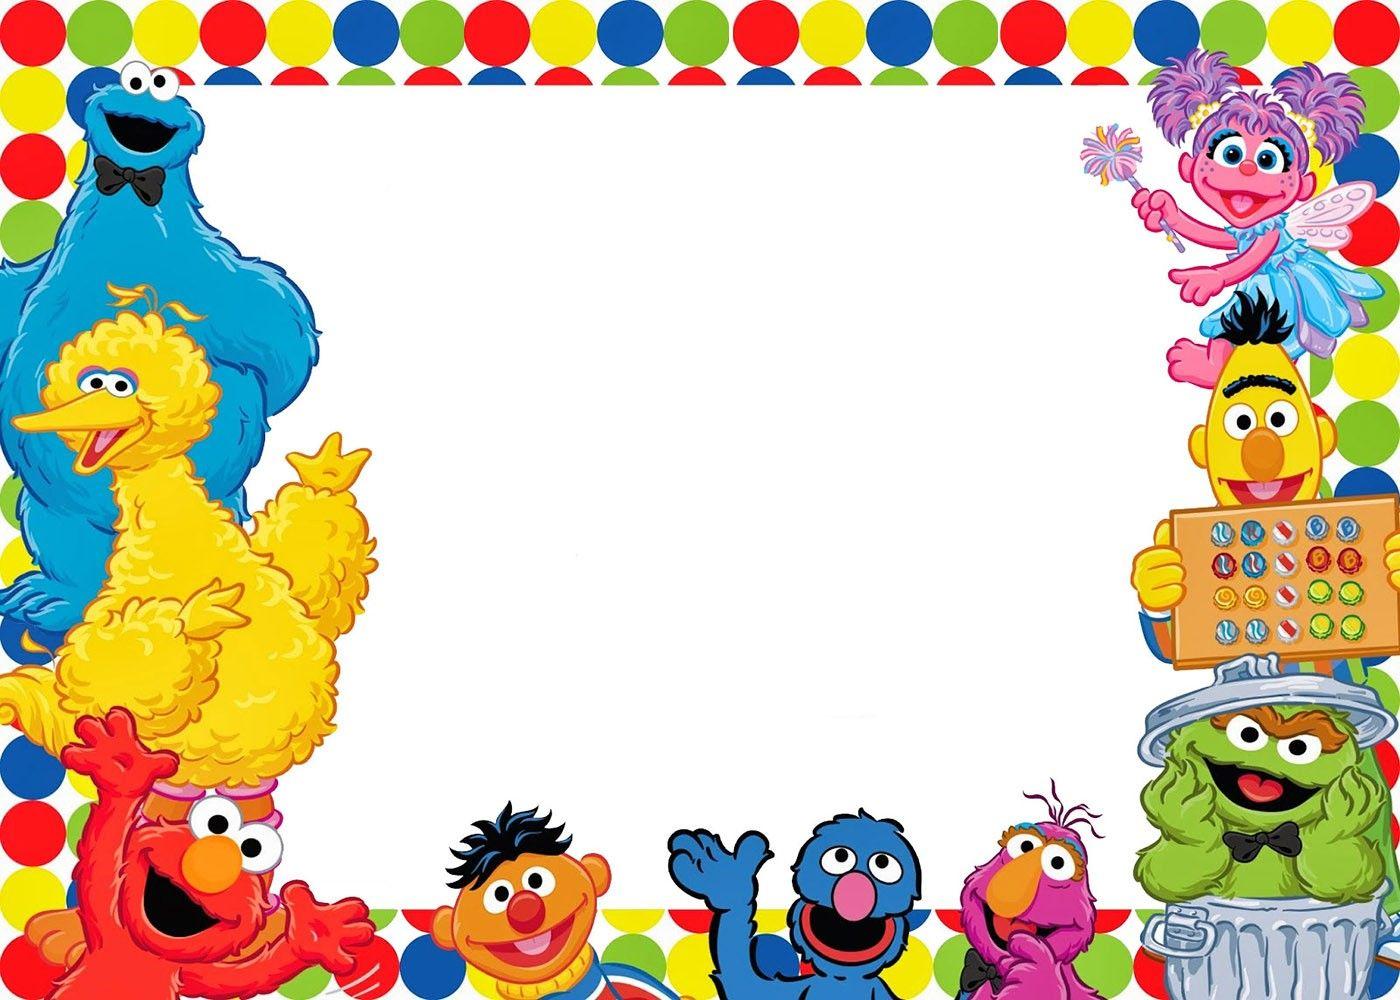 Invitacion Para Imprimir Gratis Sesame Street Sesame Street Birthday Sesame Street Invitations Sesame Street Birthday Invitations